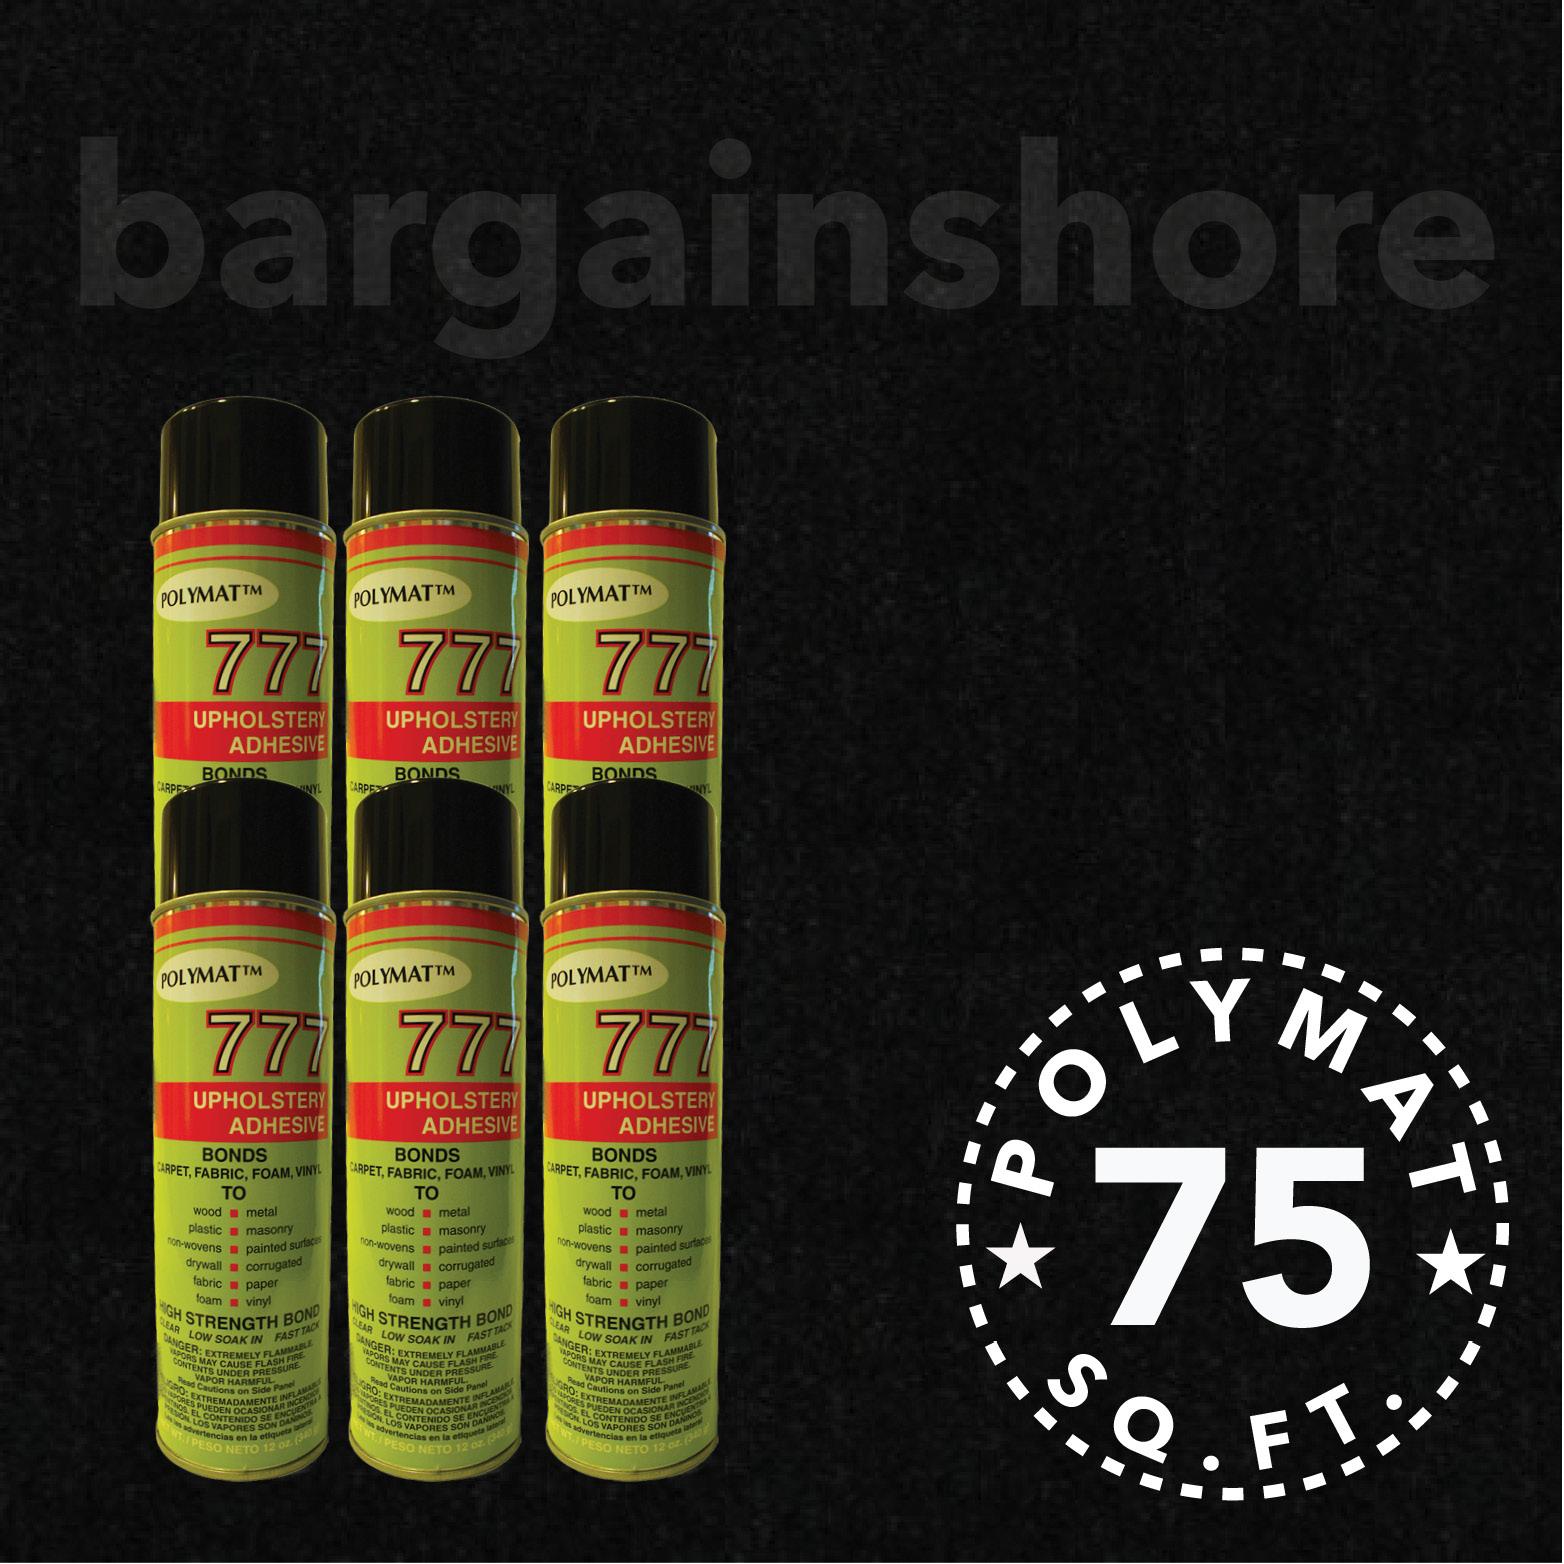 20FT x 3.75FT BLACK Speaker Box Carpet +6 Cans 777 Fabric Spray Glue…